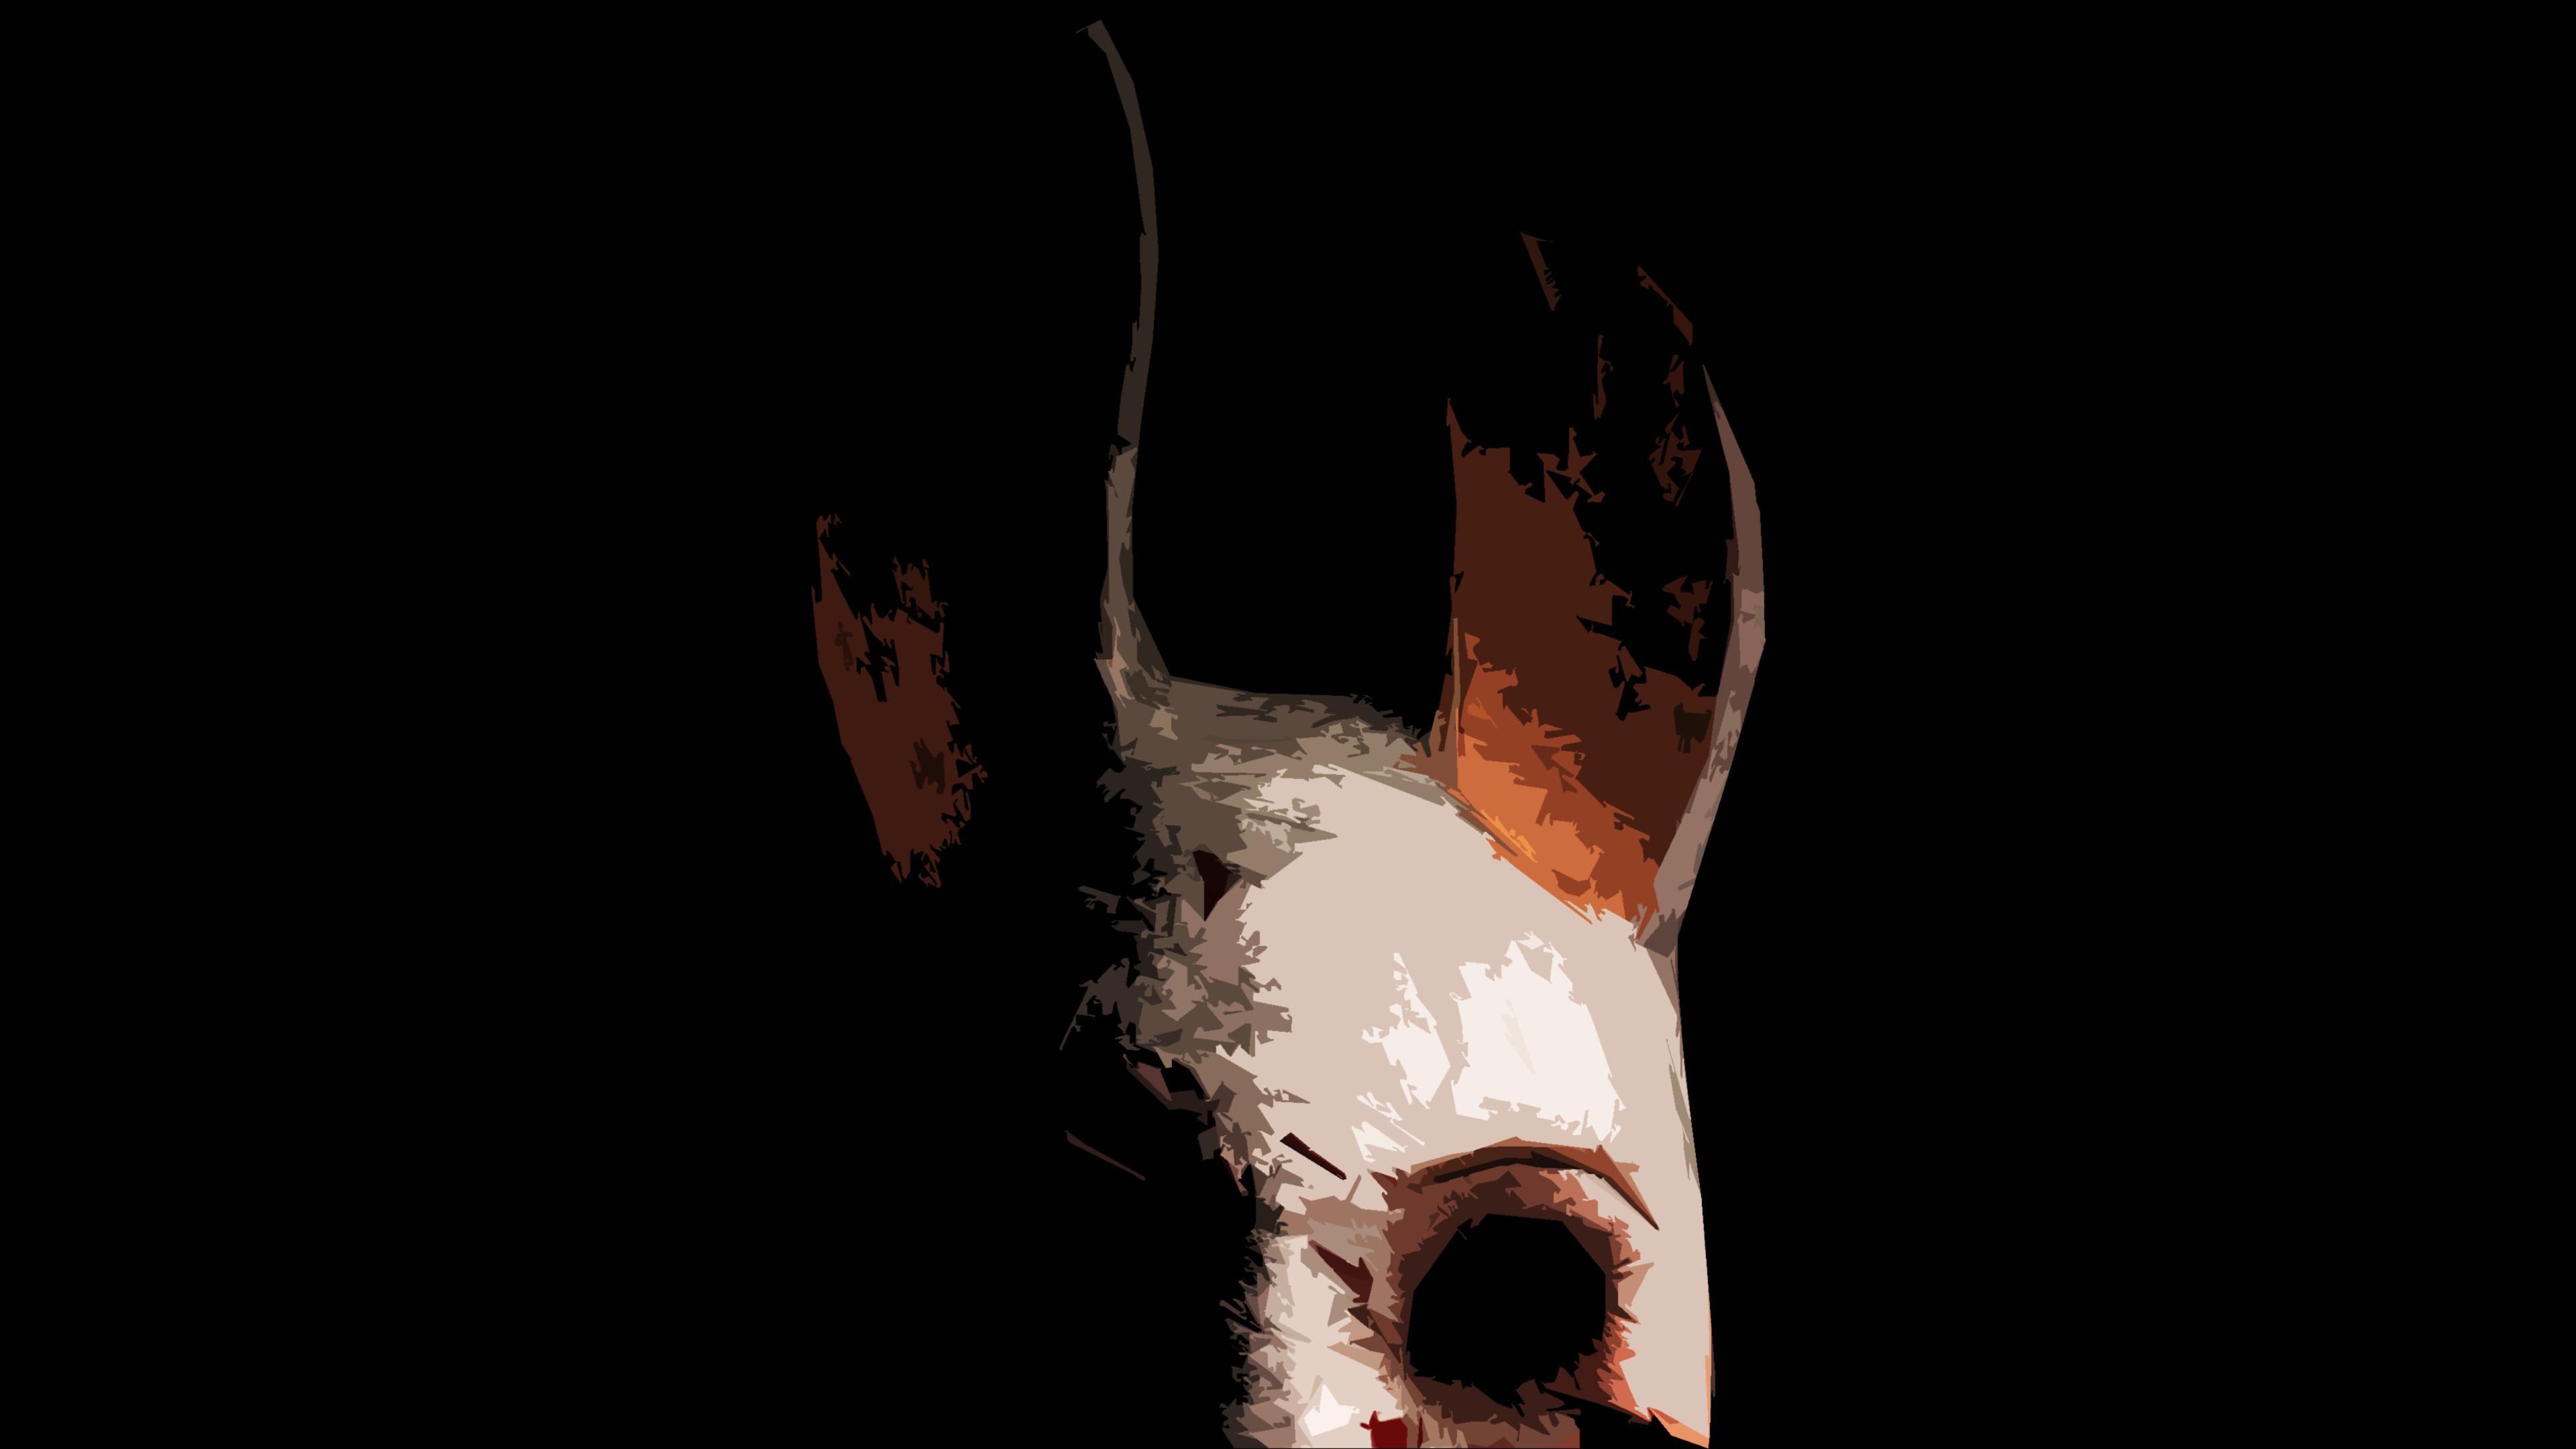 SFMPhotoshop] Huntress Wallpaper I Made deadbydaylight 3840x2160